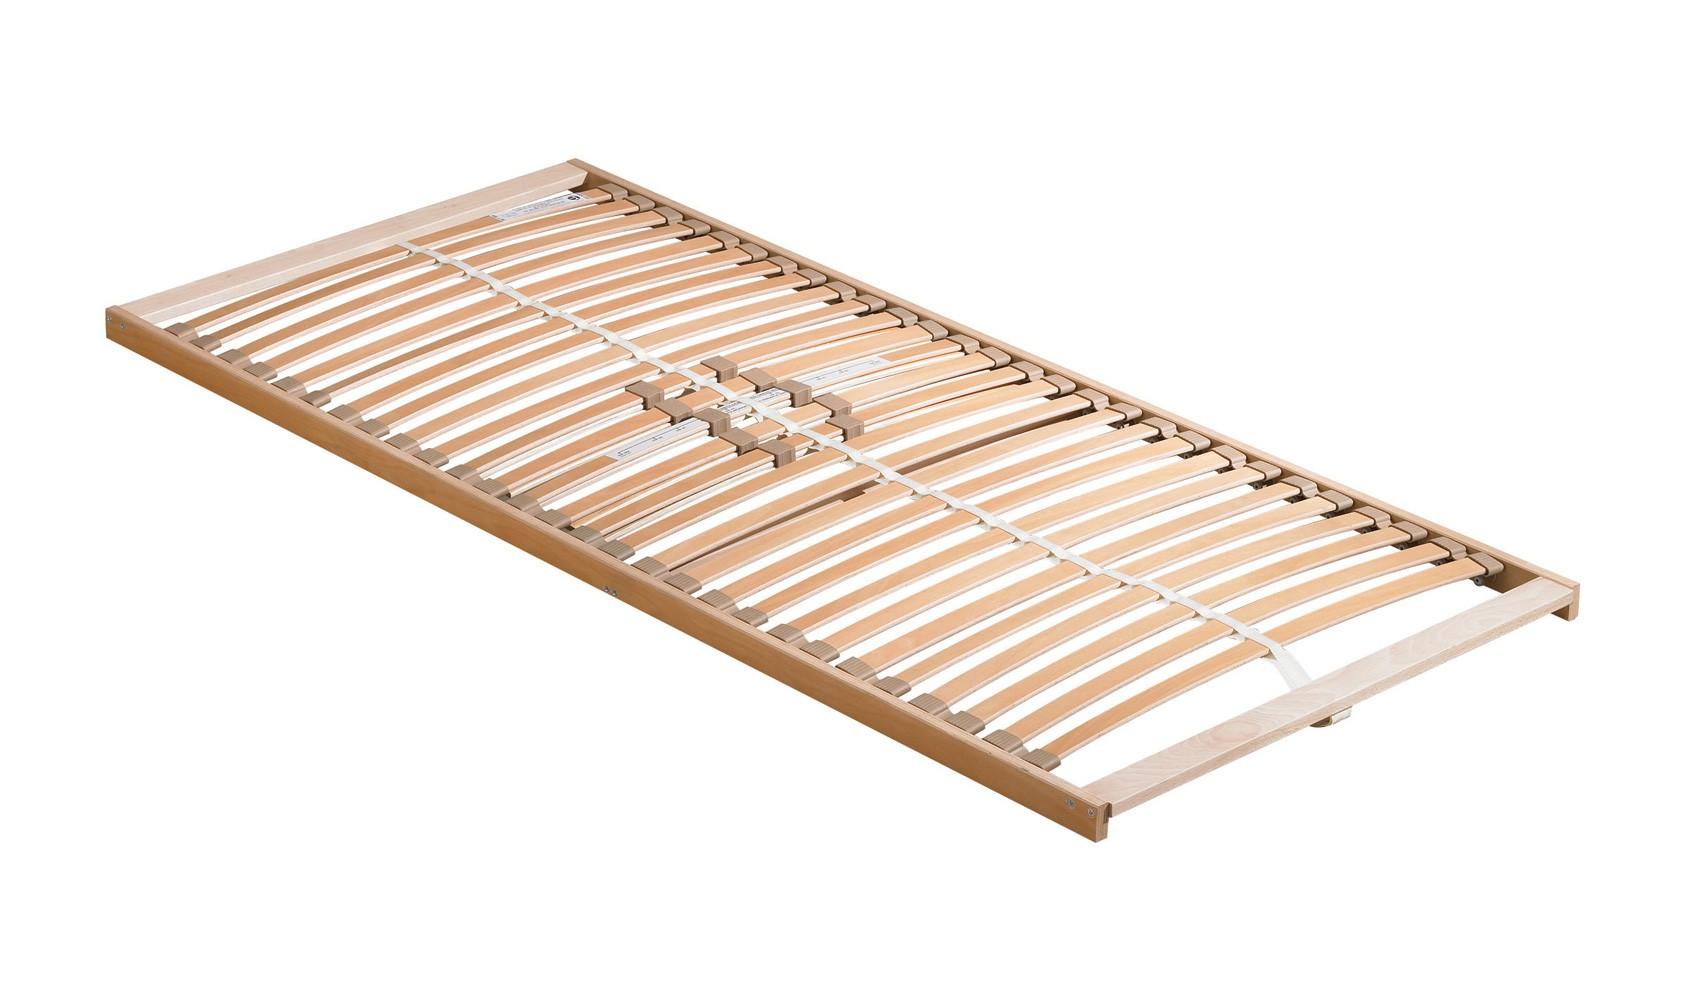 Paidi Lattenrost Comfort unverstellbar, mit 28 Federleisten